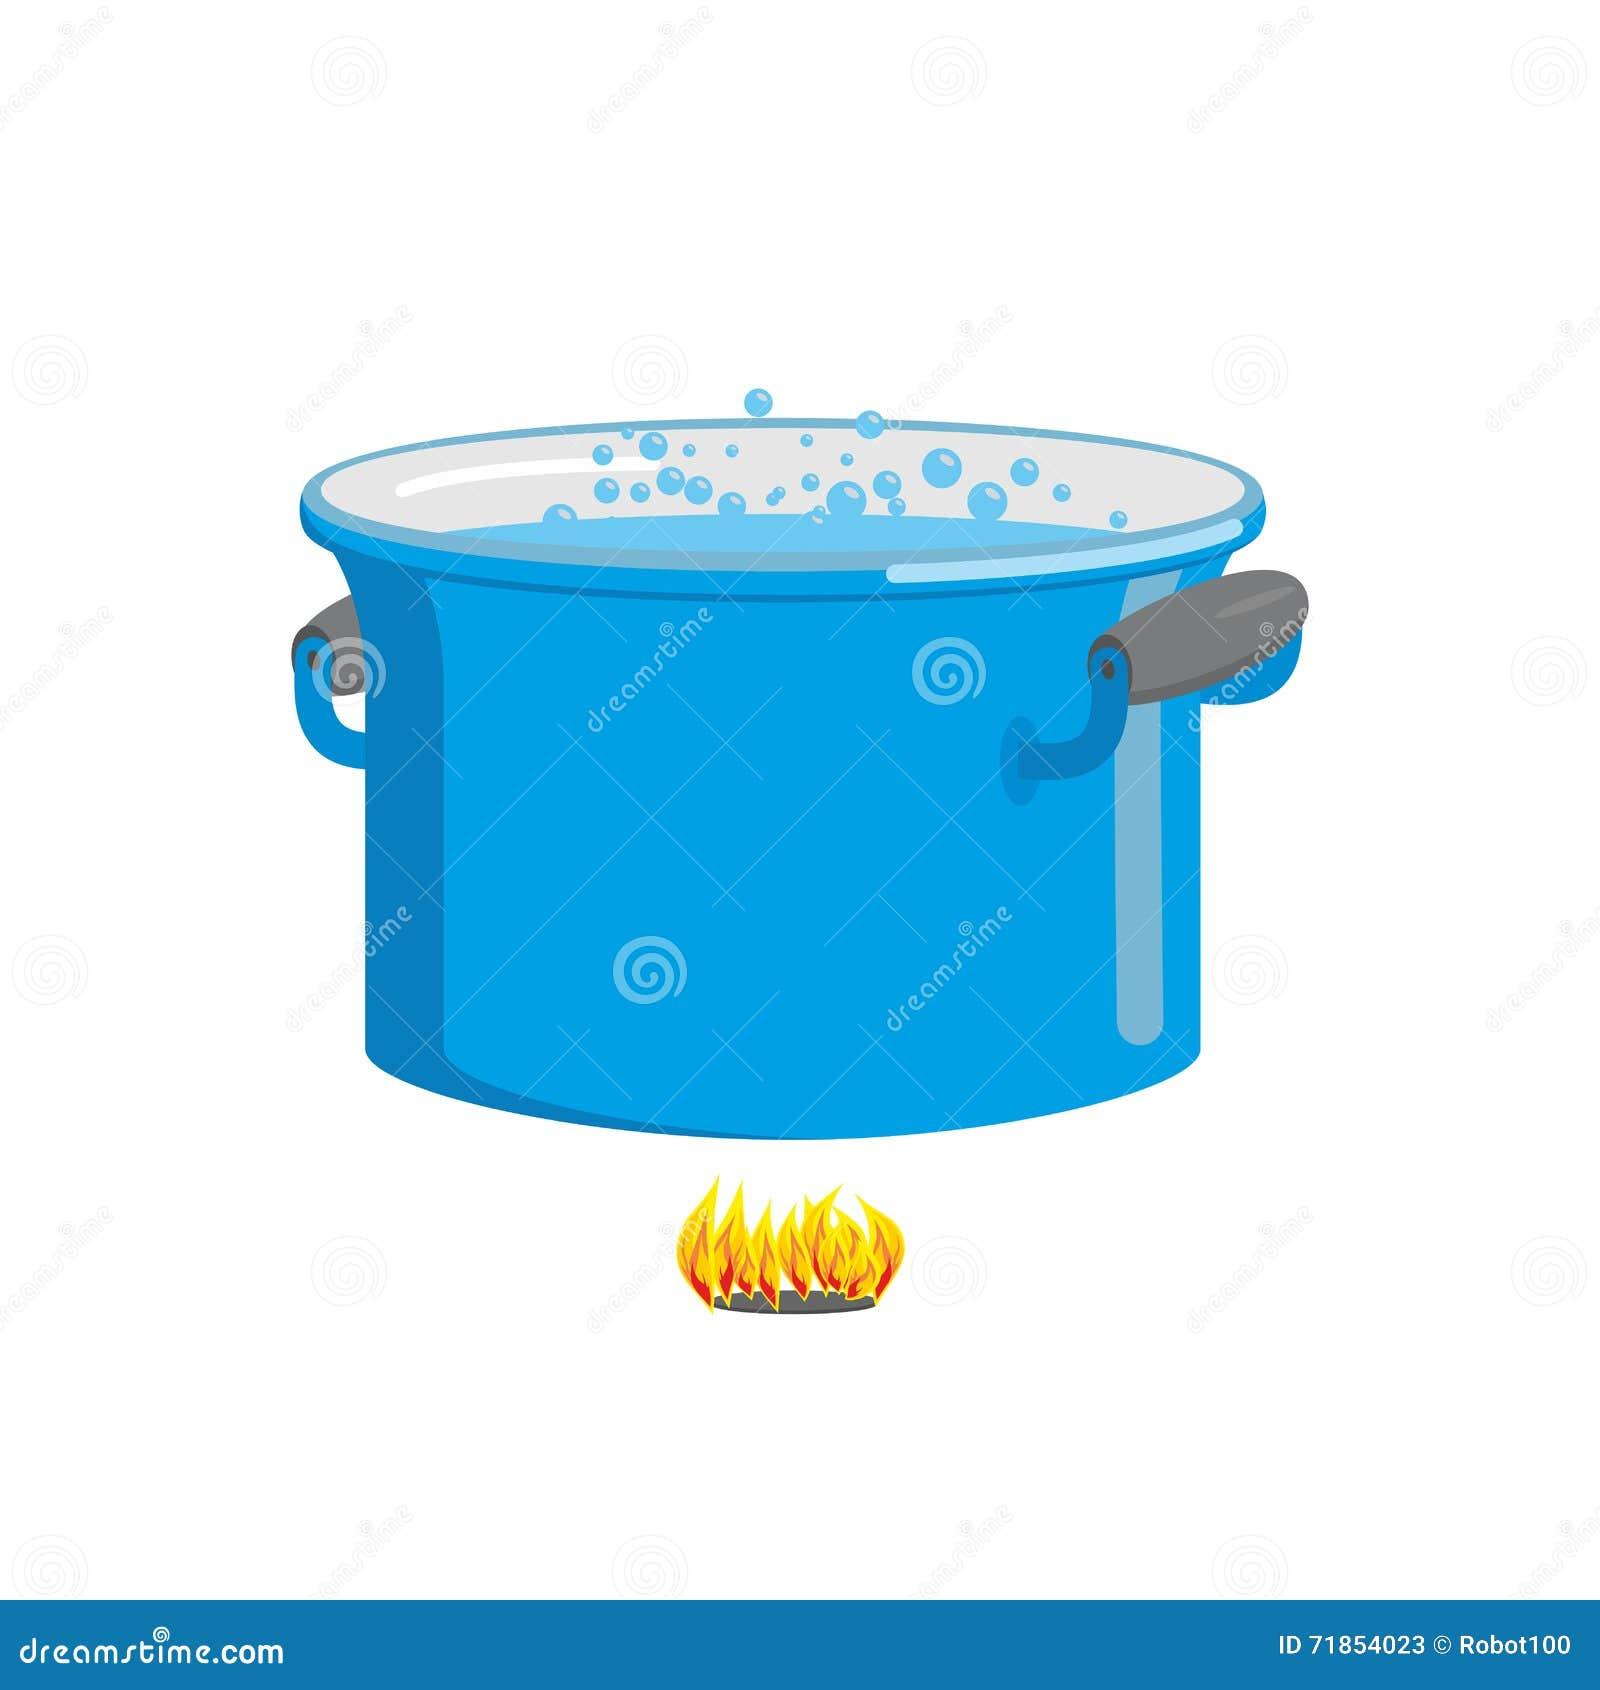 topf kochendes wasser auf feuer kochen des lebensmittels blaues kochgeschirr vektor abbildung. Black Bedroom Furniture Sets. Home Design Ideas